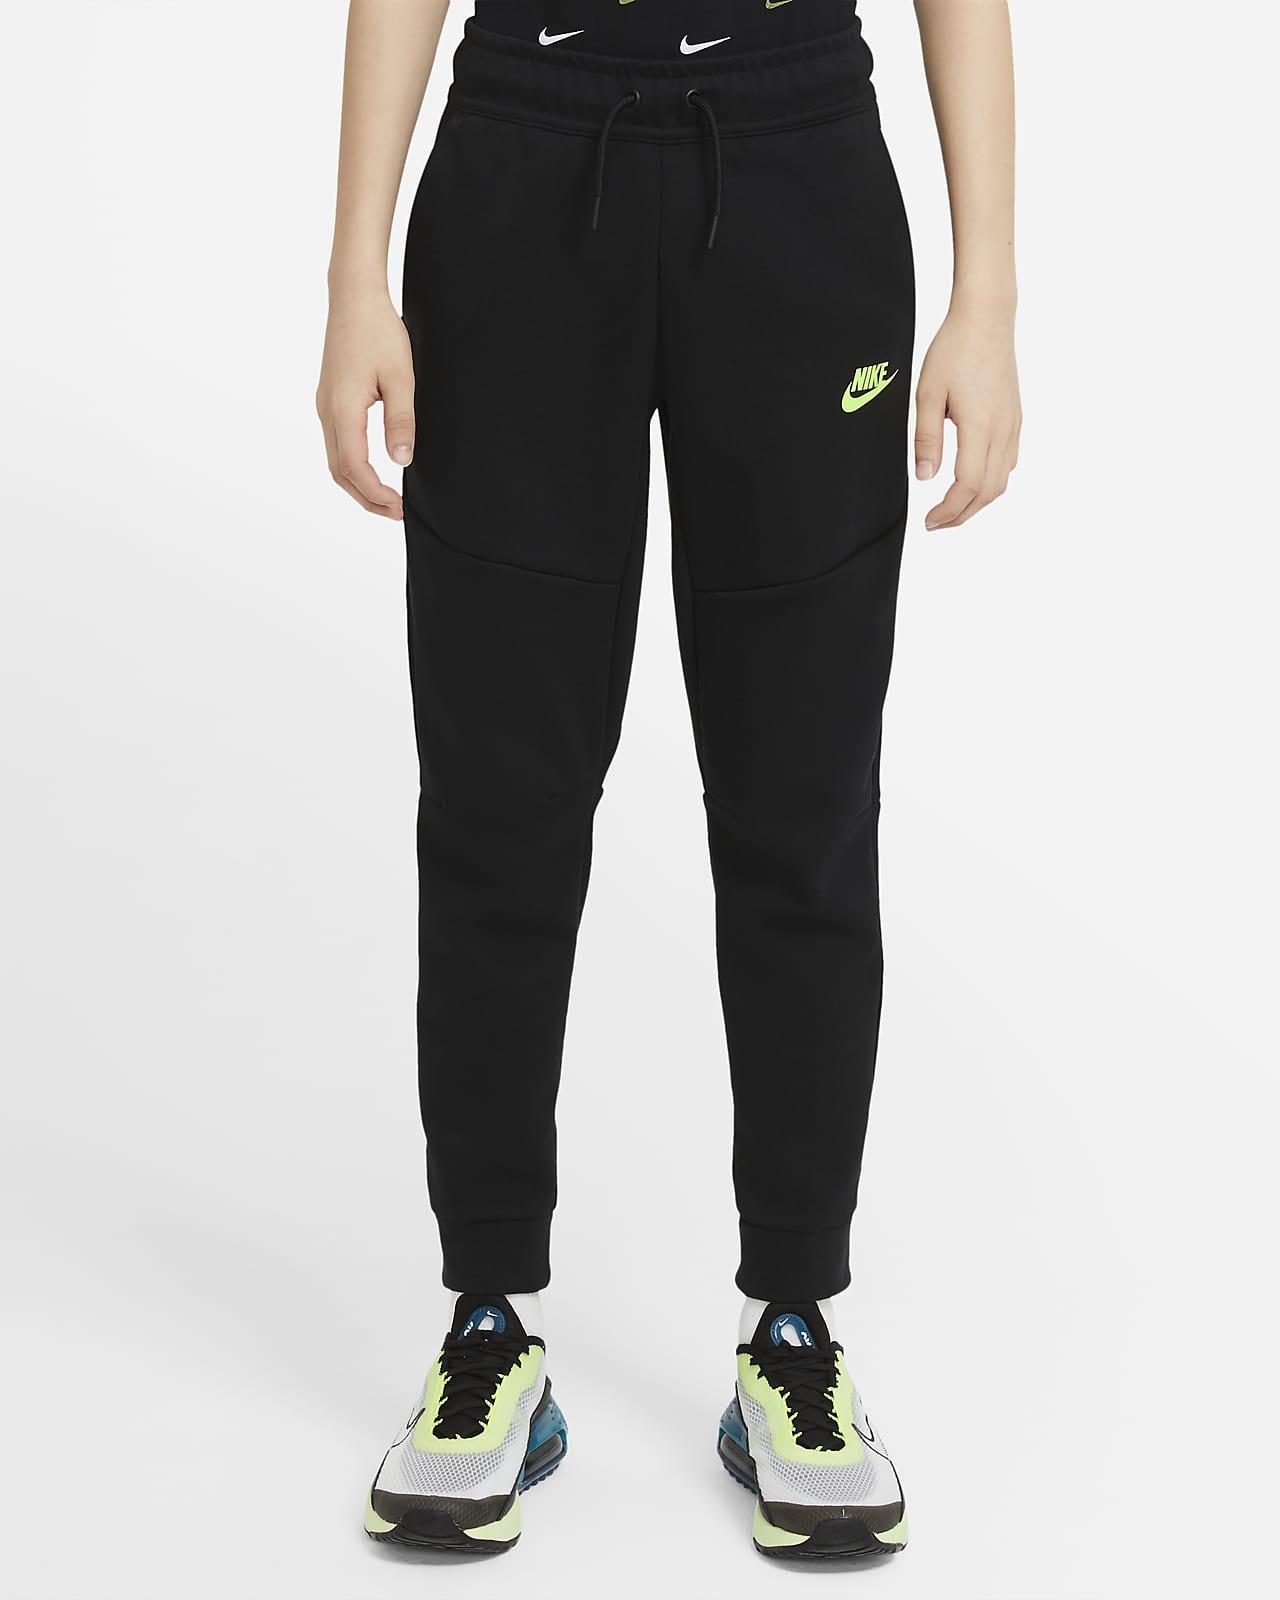 Calças Nike Sportswear Tech Fleece Júnior (Rapaz)